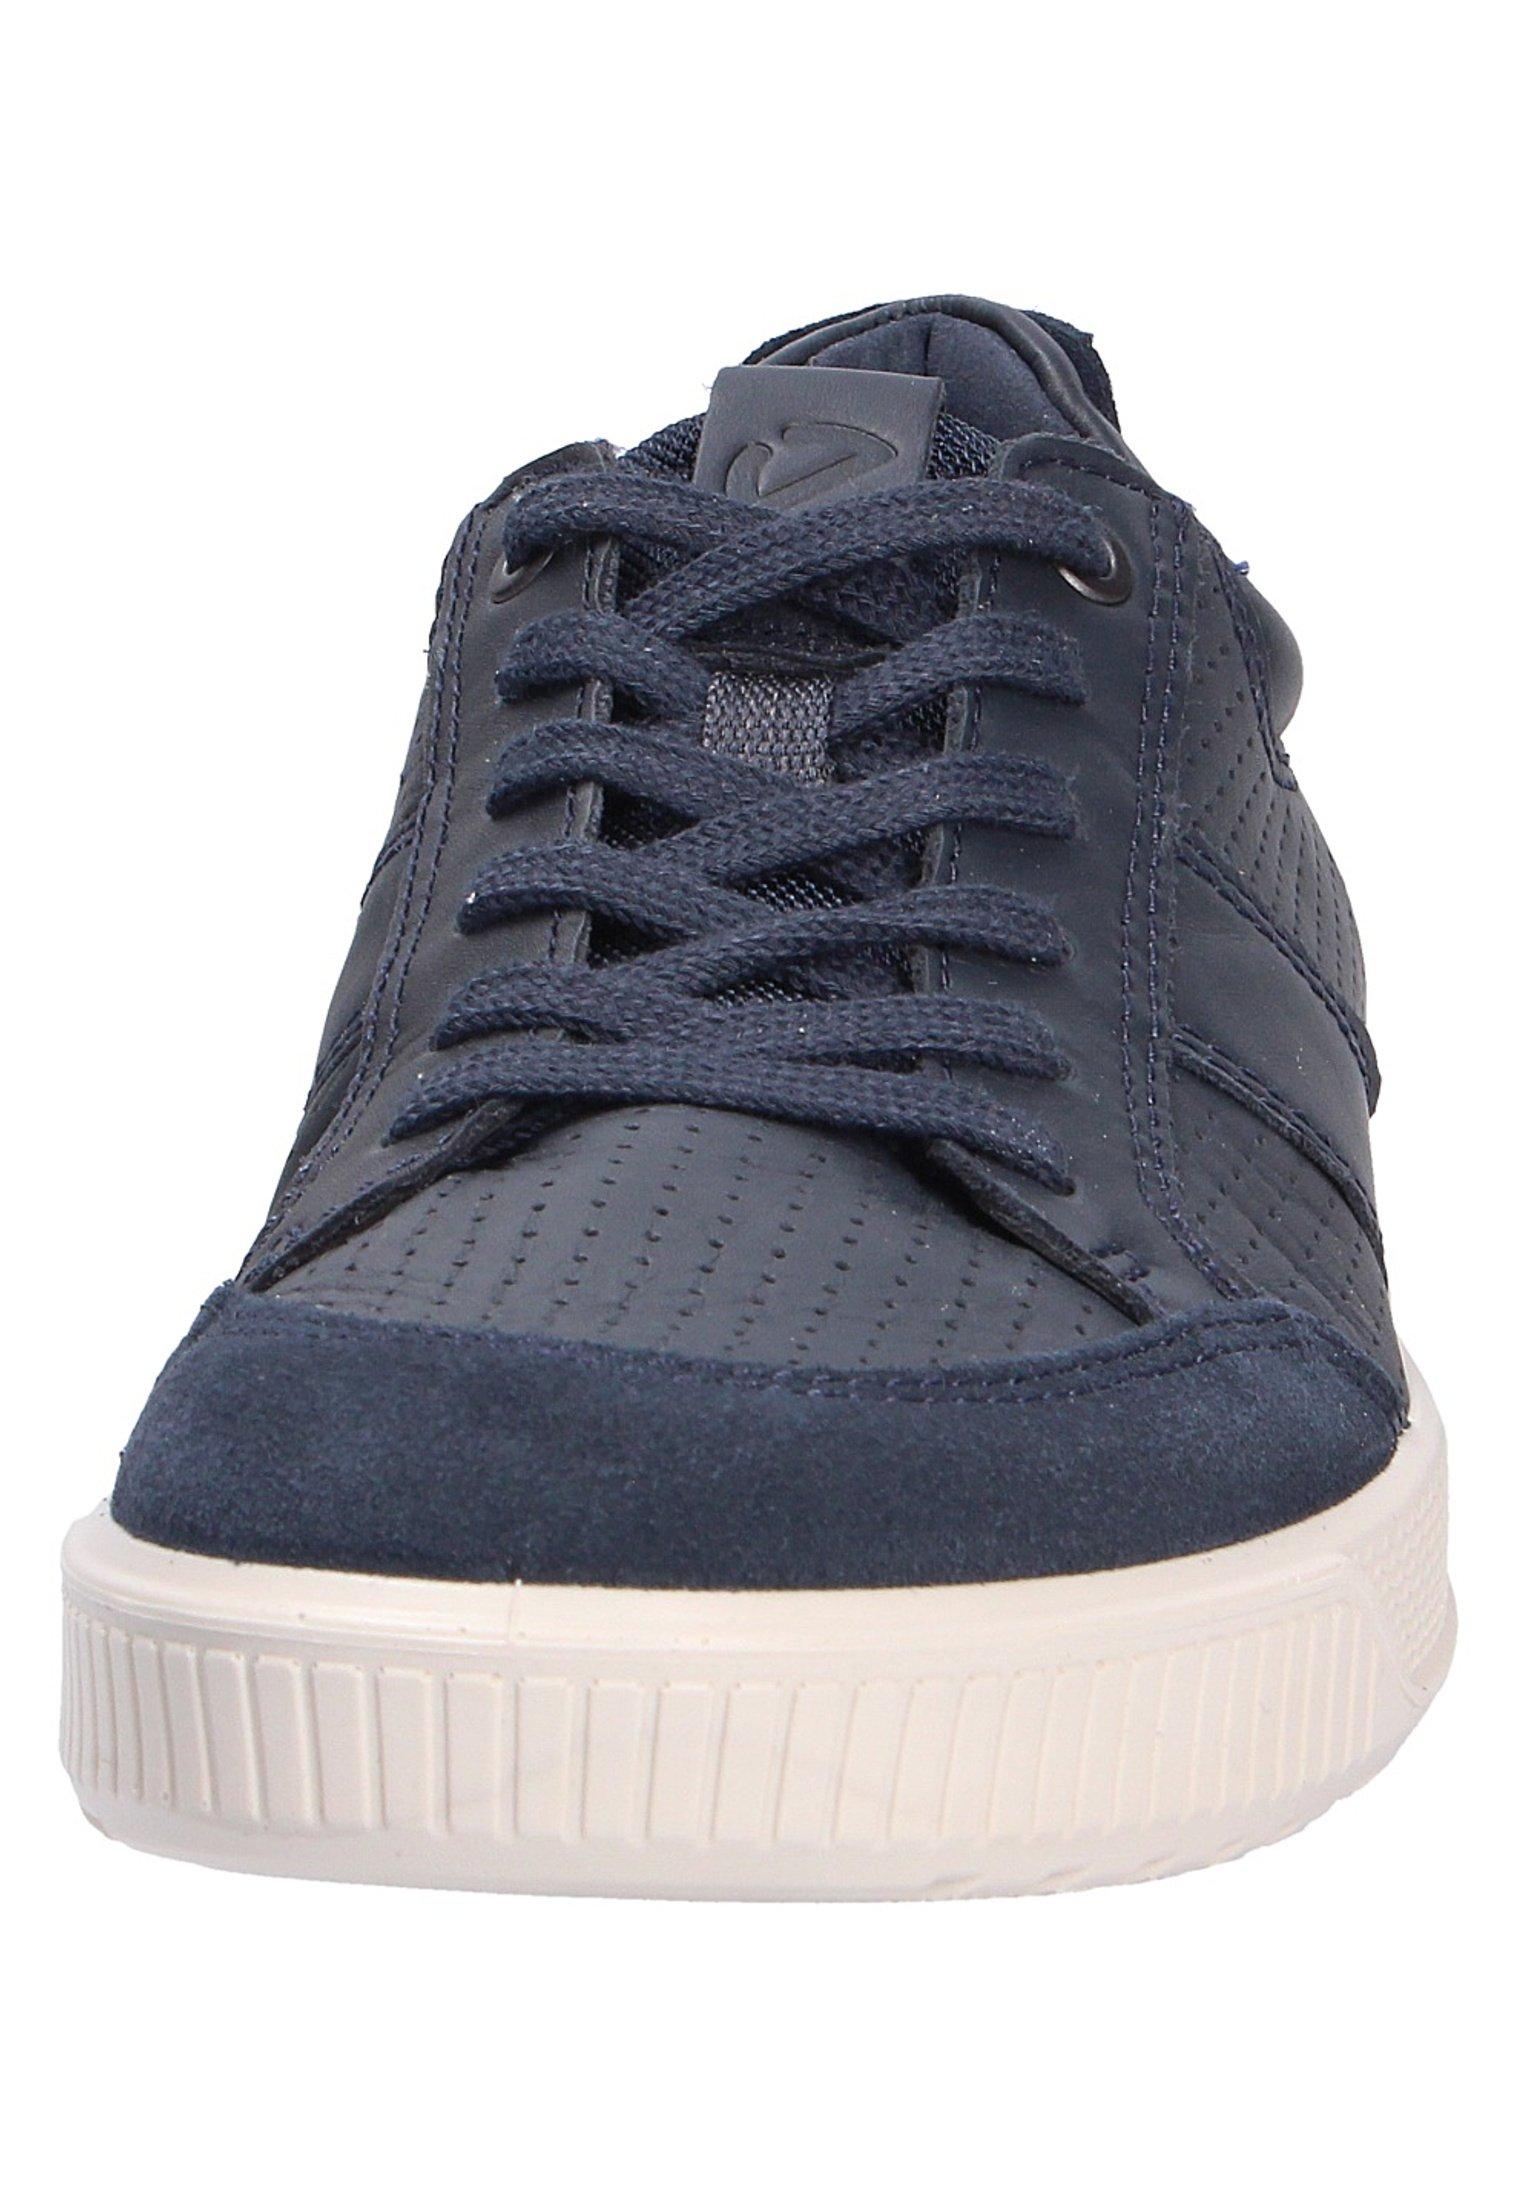 ECCO BYWAY - Sneaker low - navy/blau - Herrenschuhe WRZaL